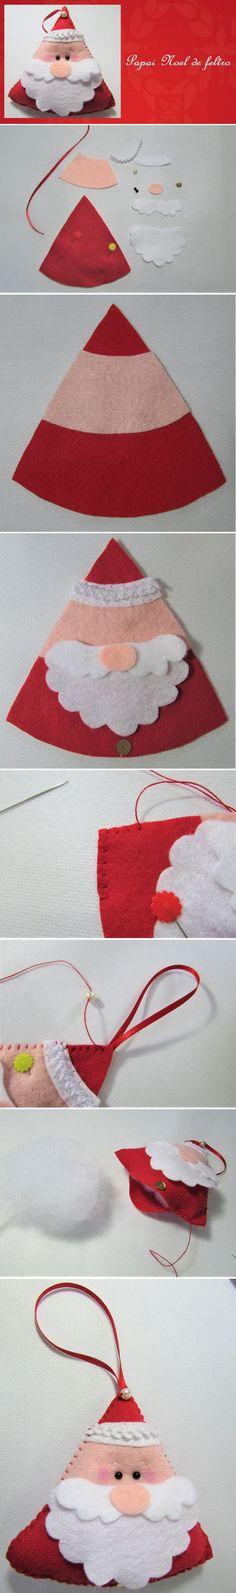 How to Make a Felt Santa Claus